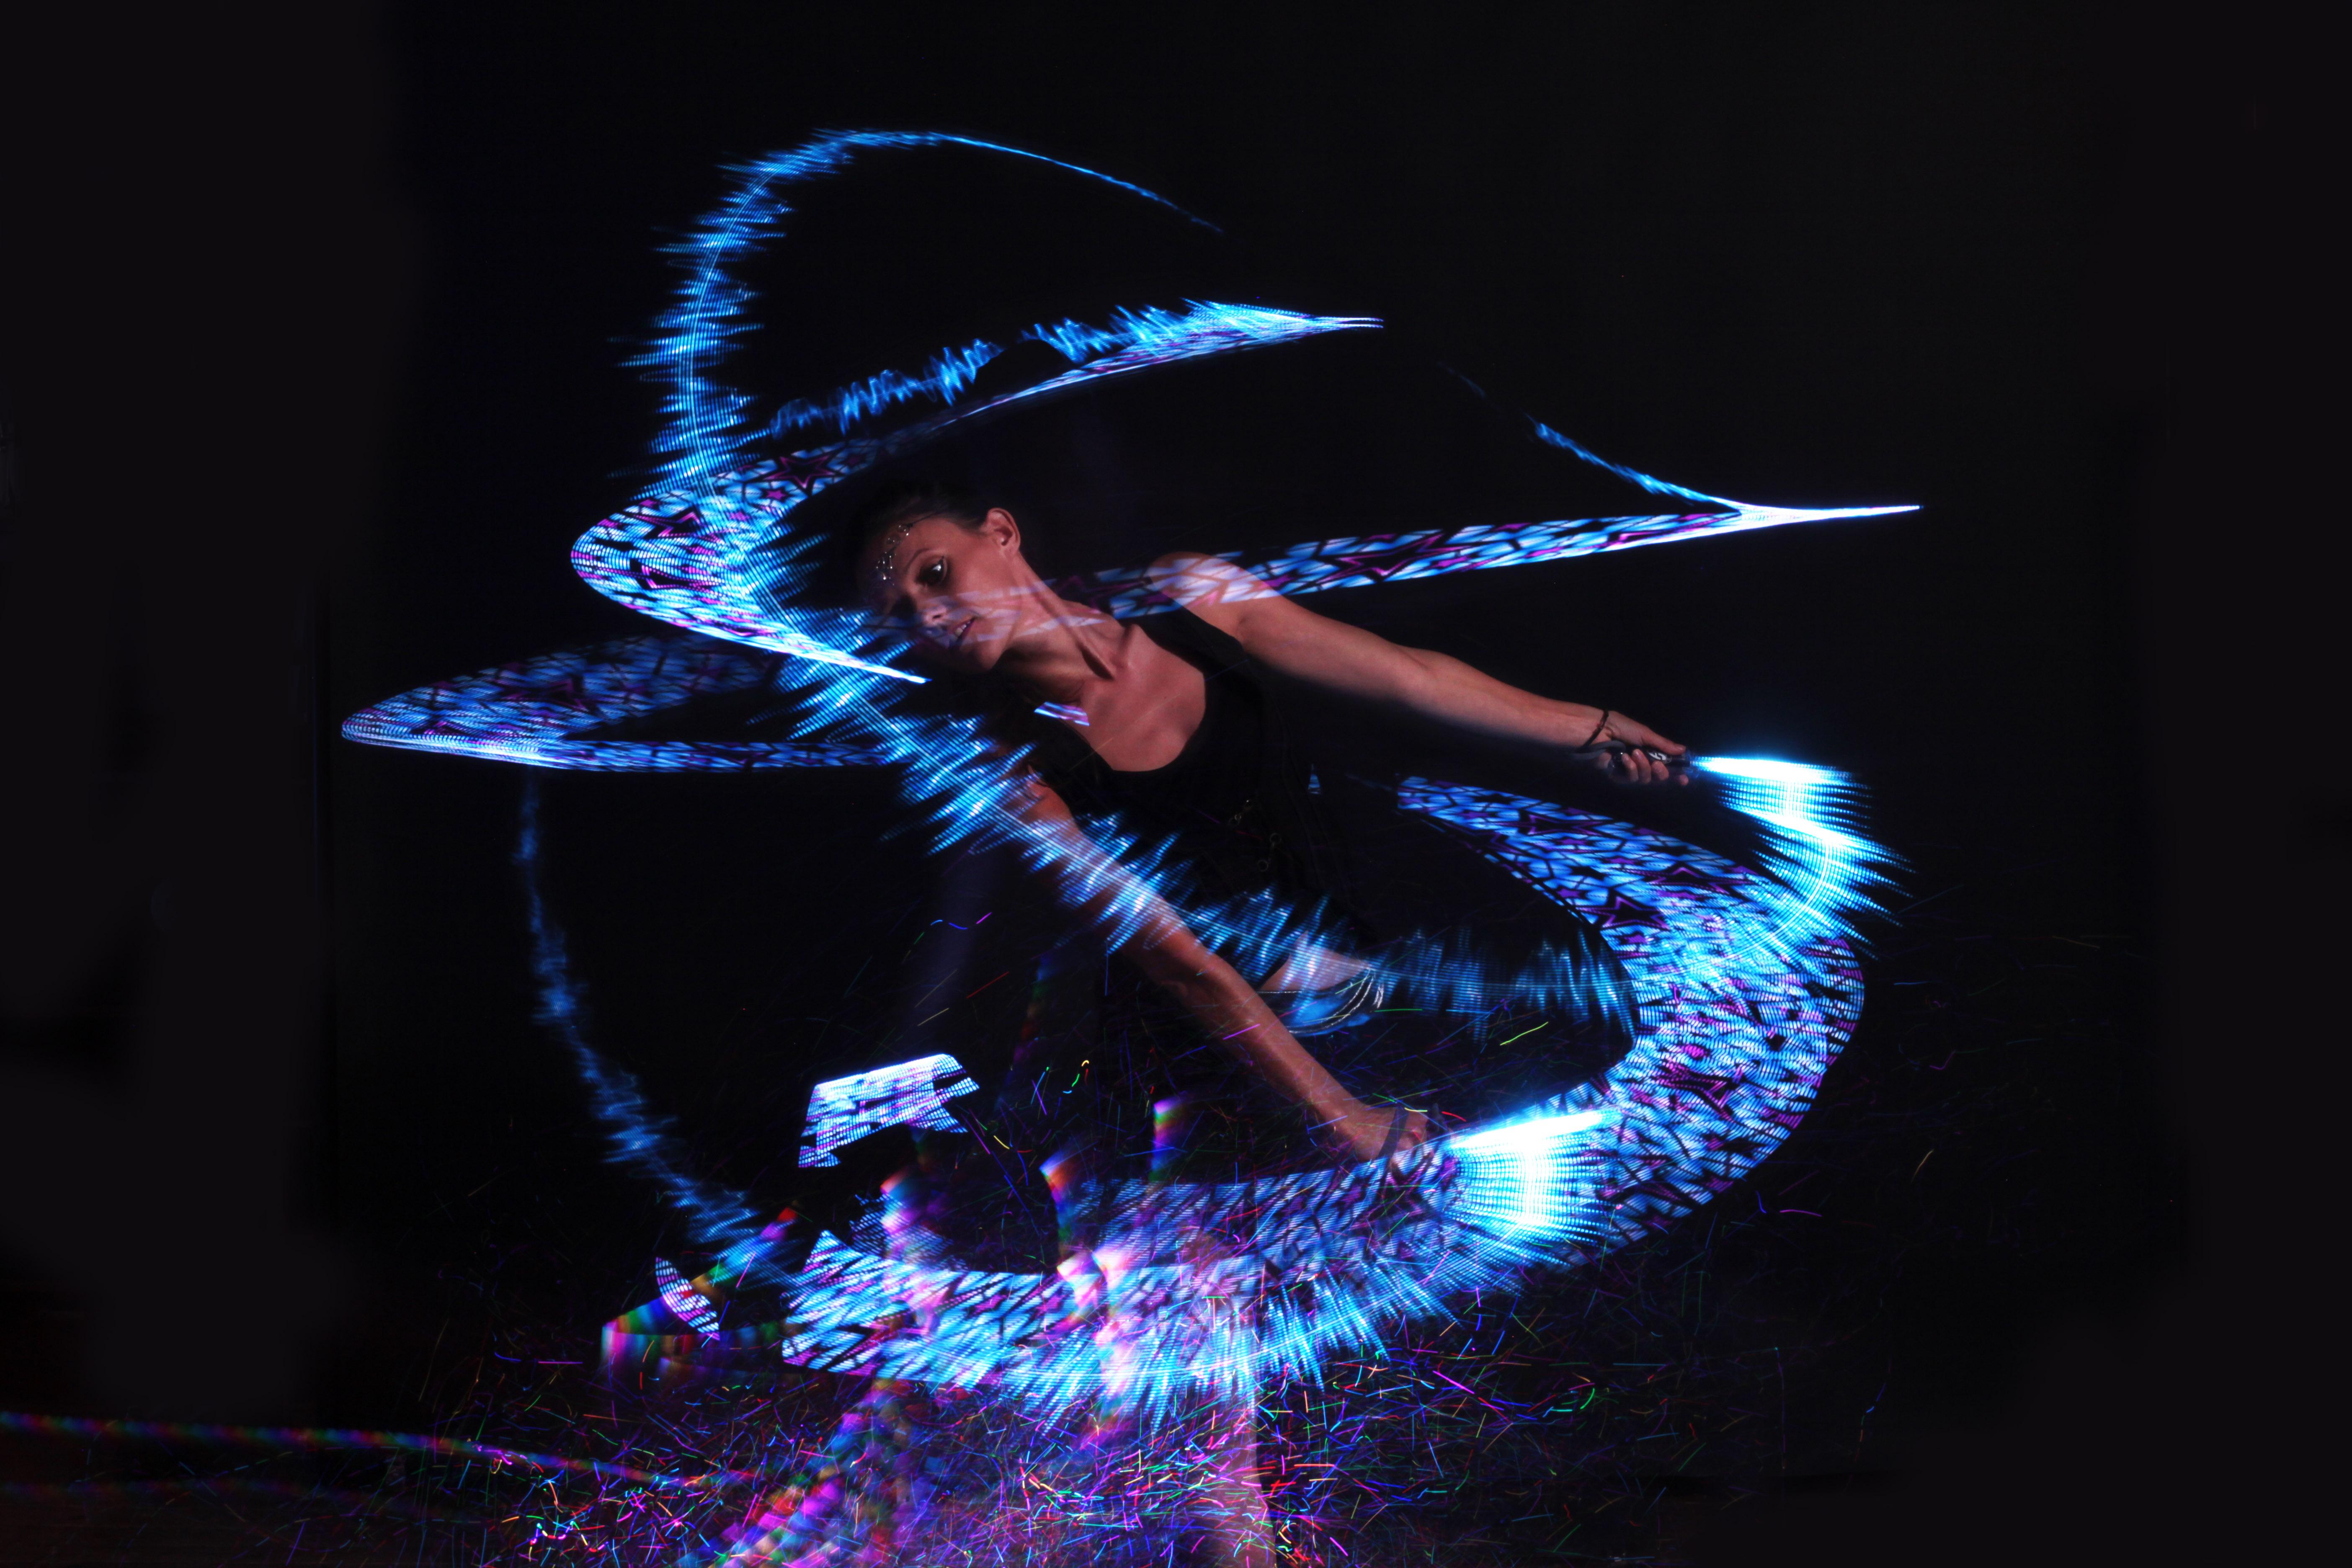 Light show special effect